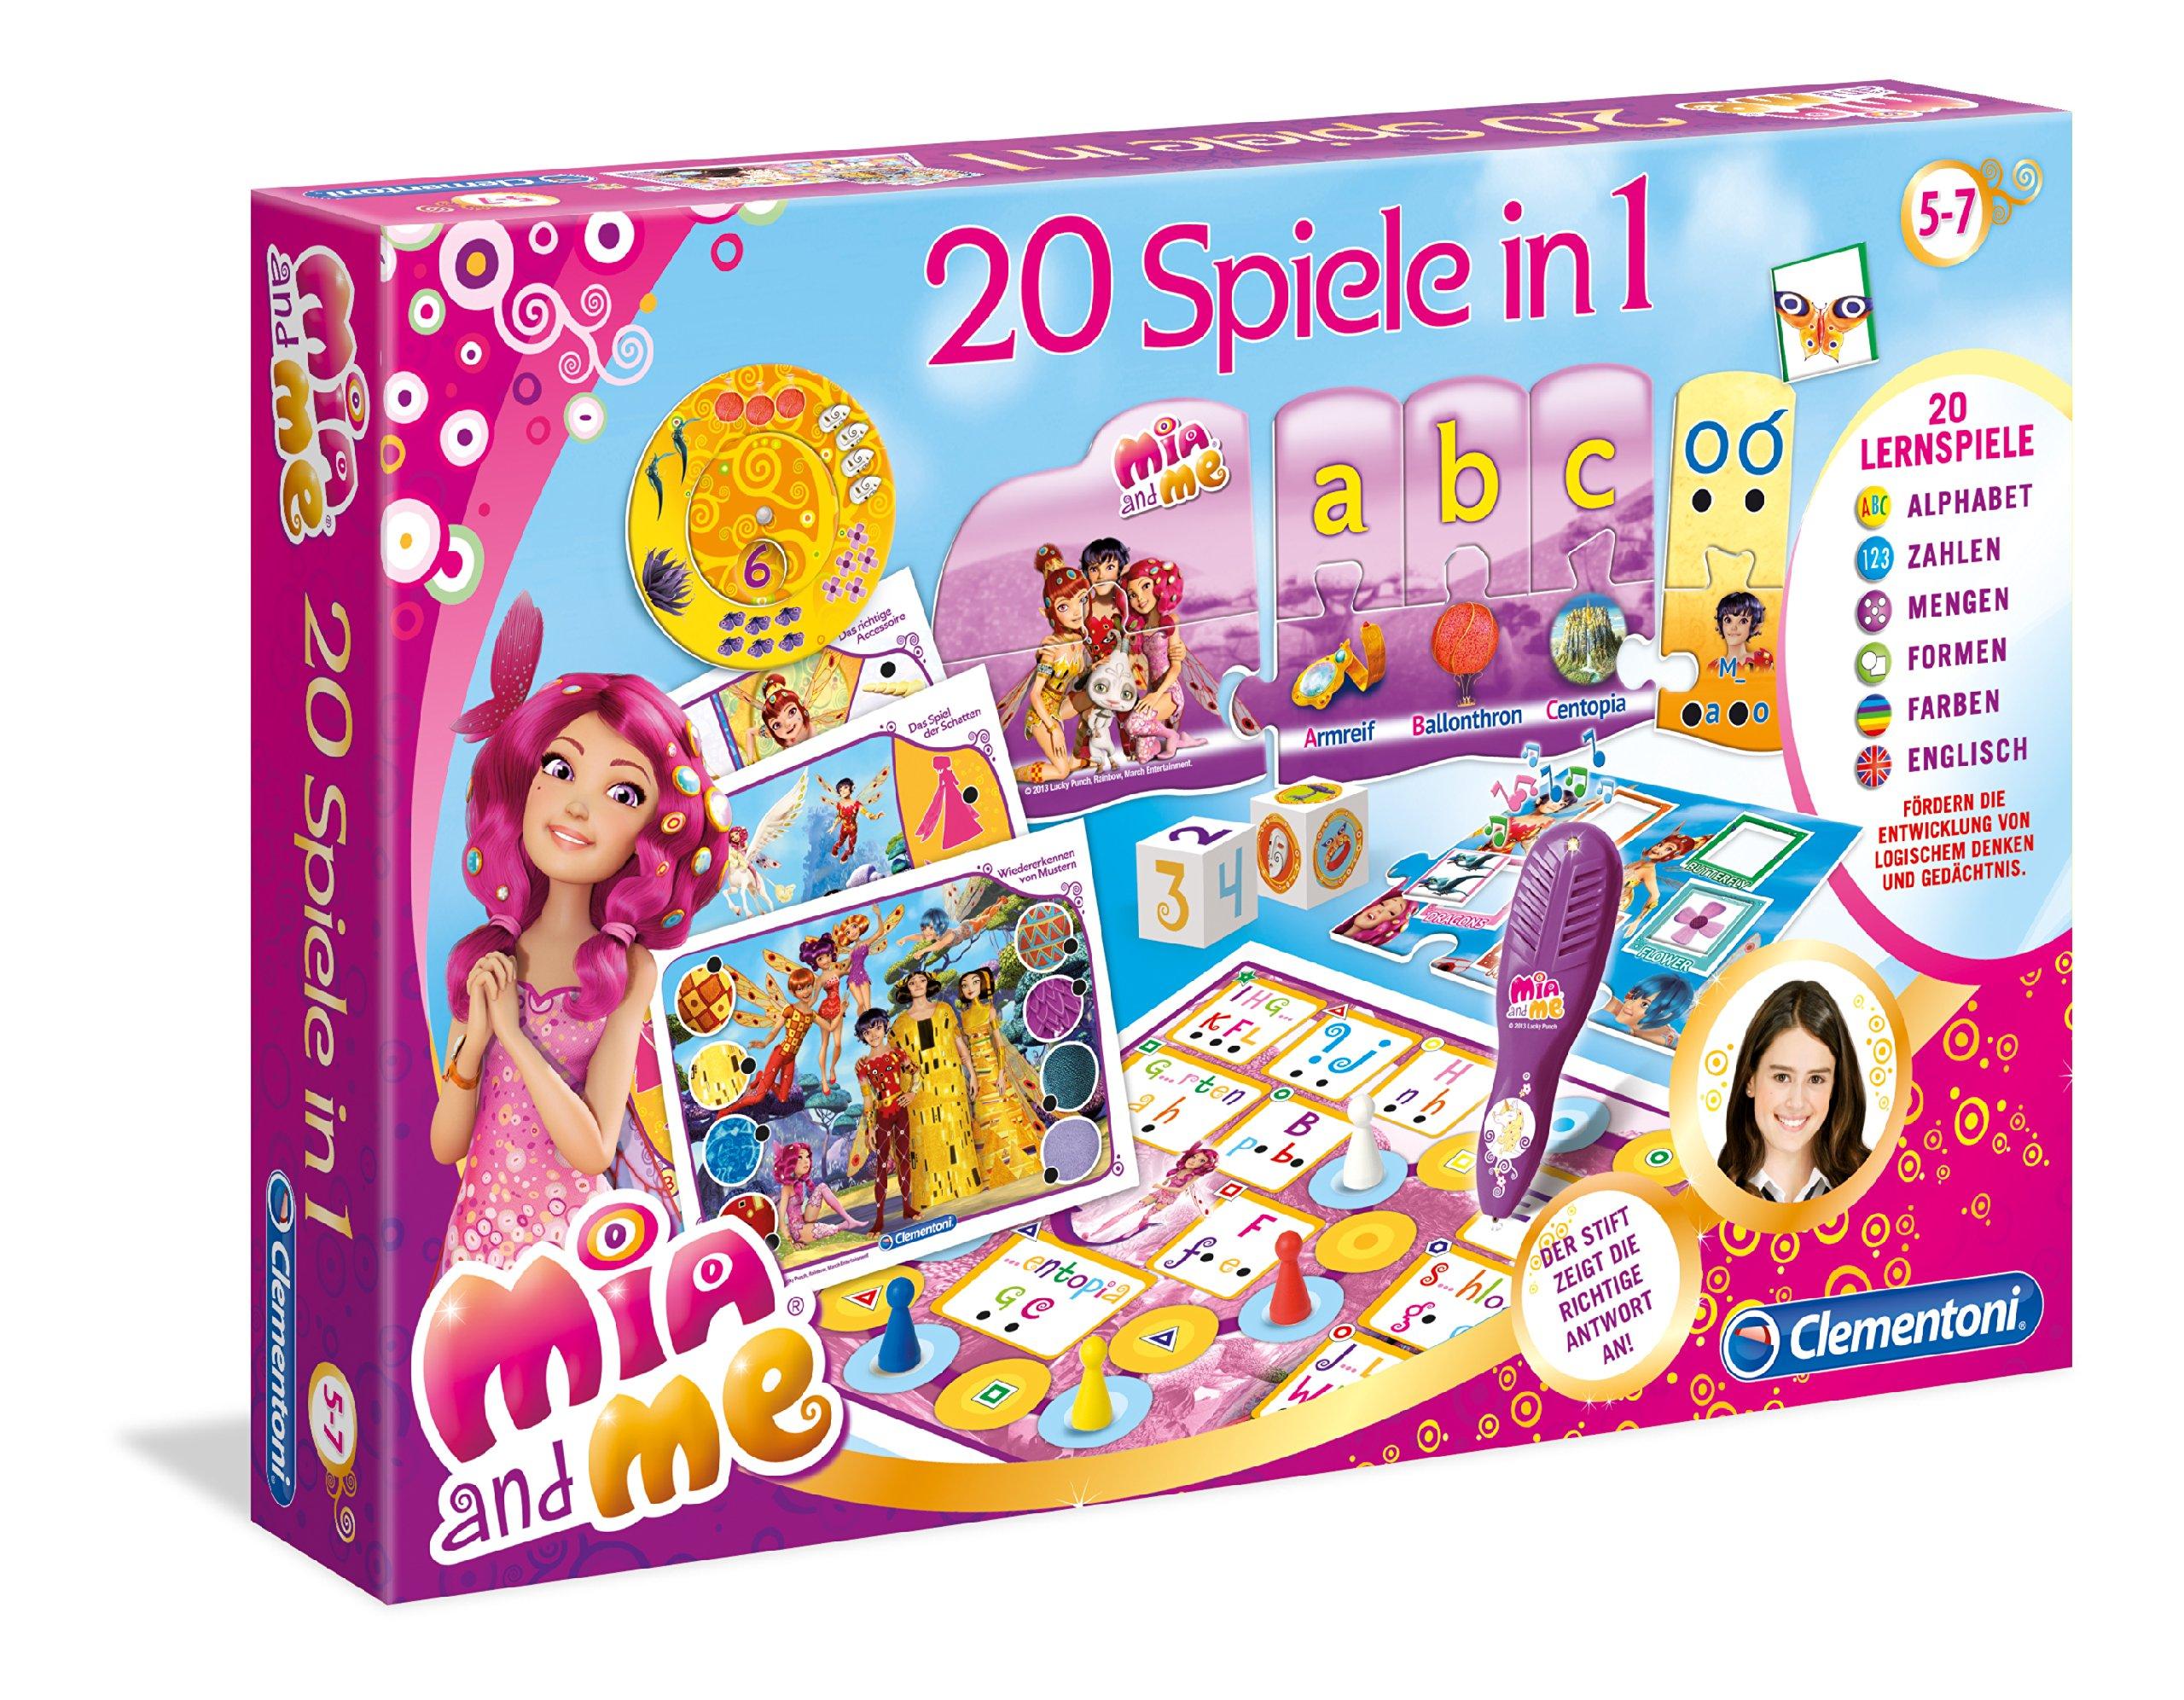 Clementoni-691821-20-Spiele-in-1-Mia-und-me Clementoni 69182.1 – 20 Spiele in 1 – Mia und me -